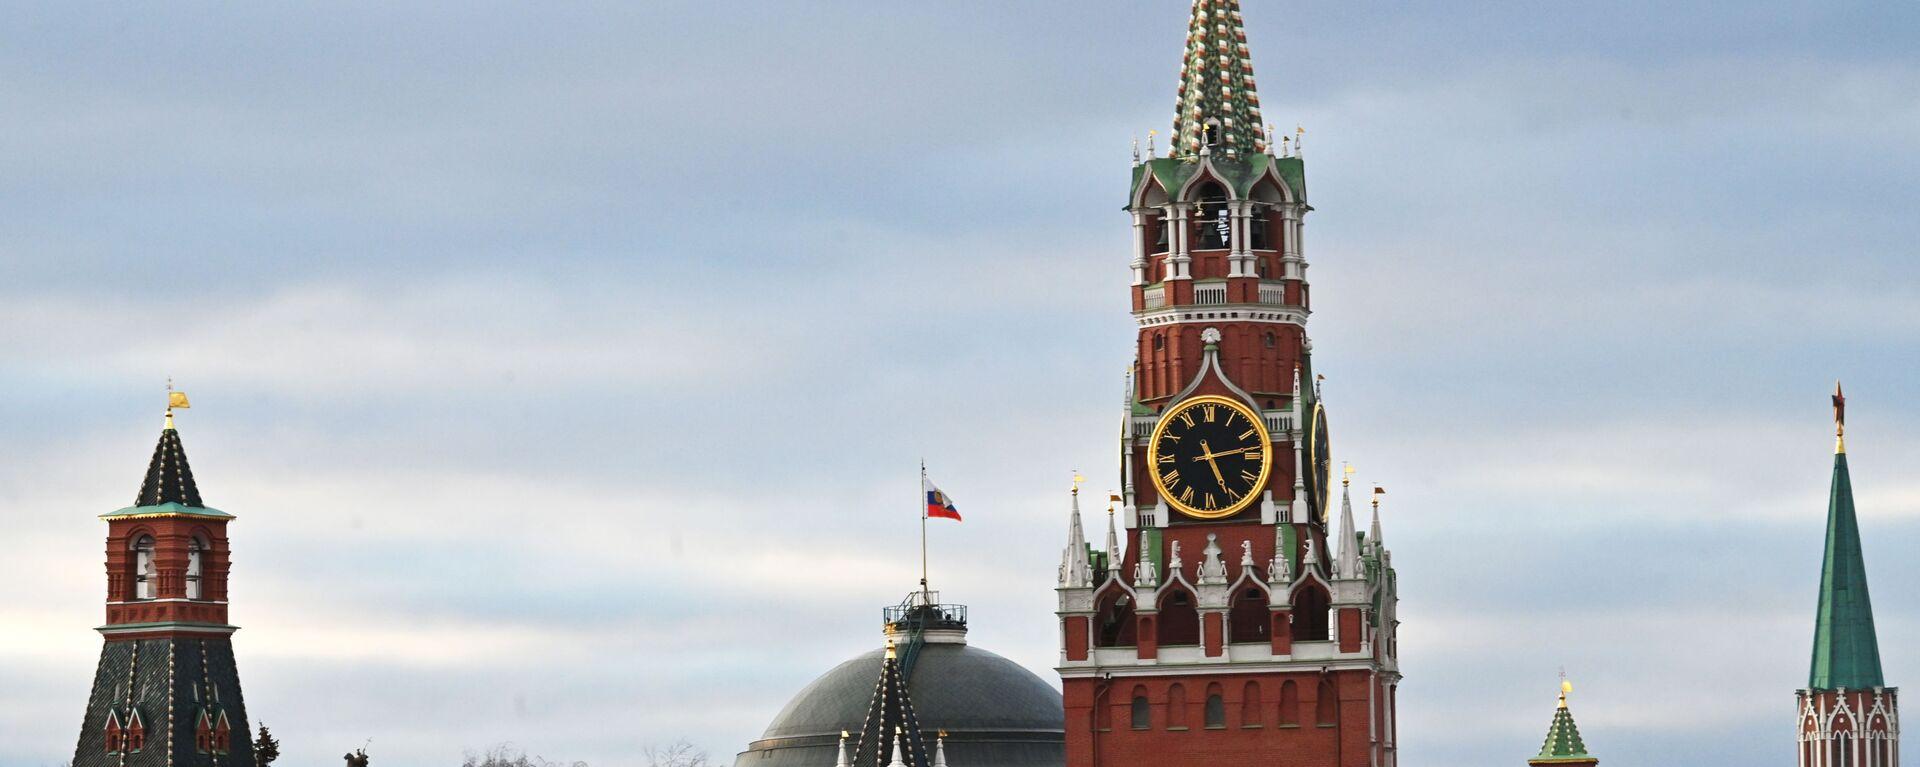 Kremlin - Sputnik Mundo, 1920, 29.04.2021